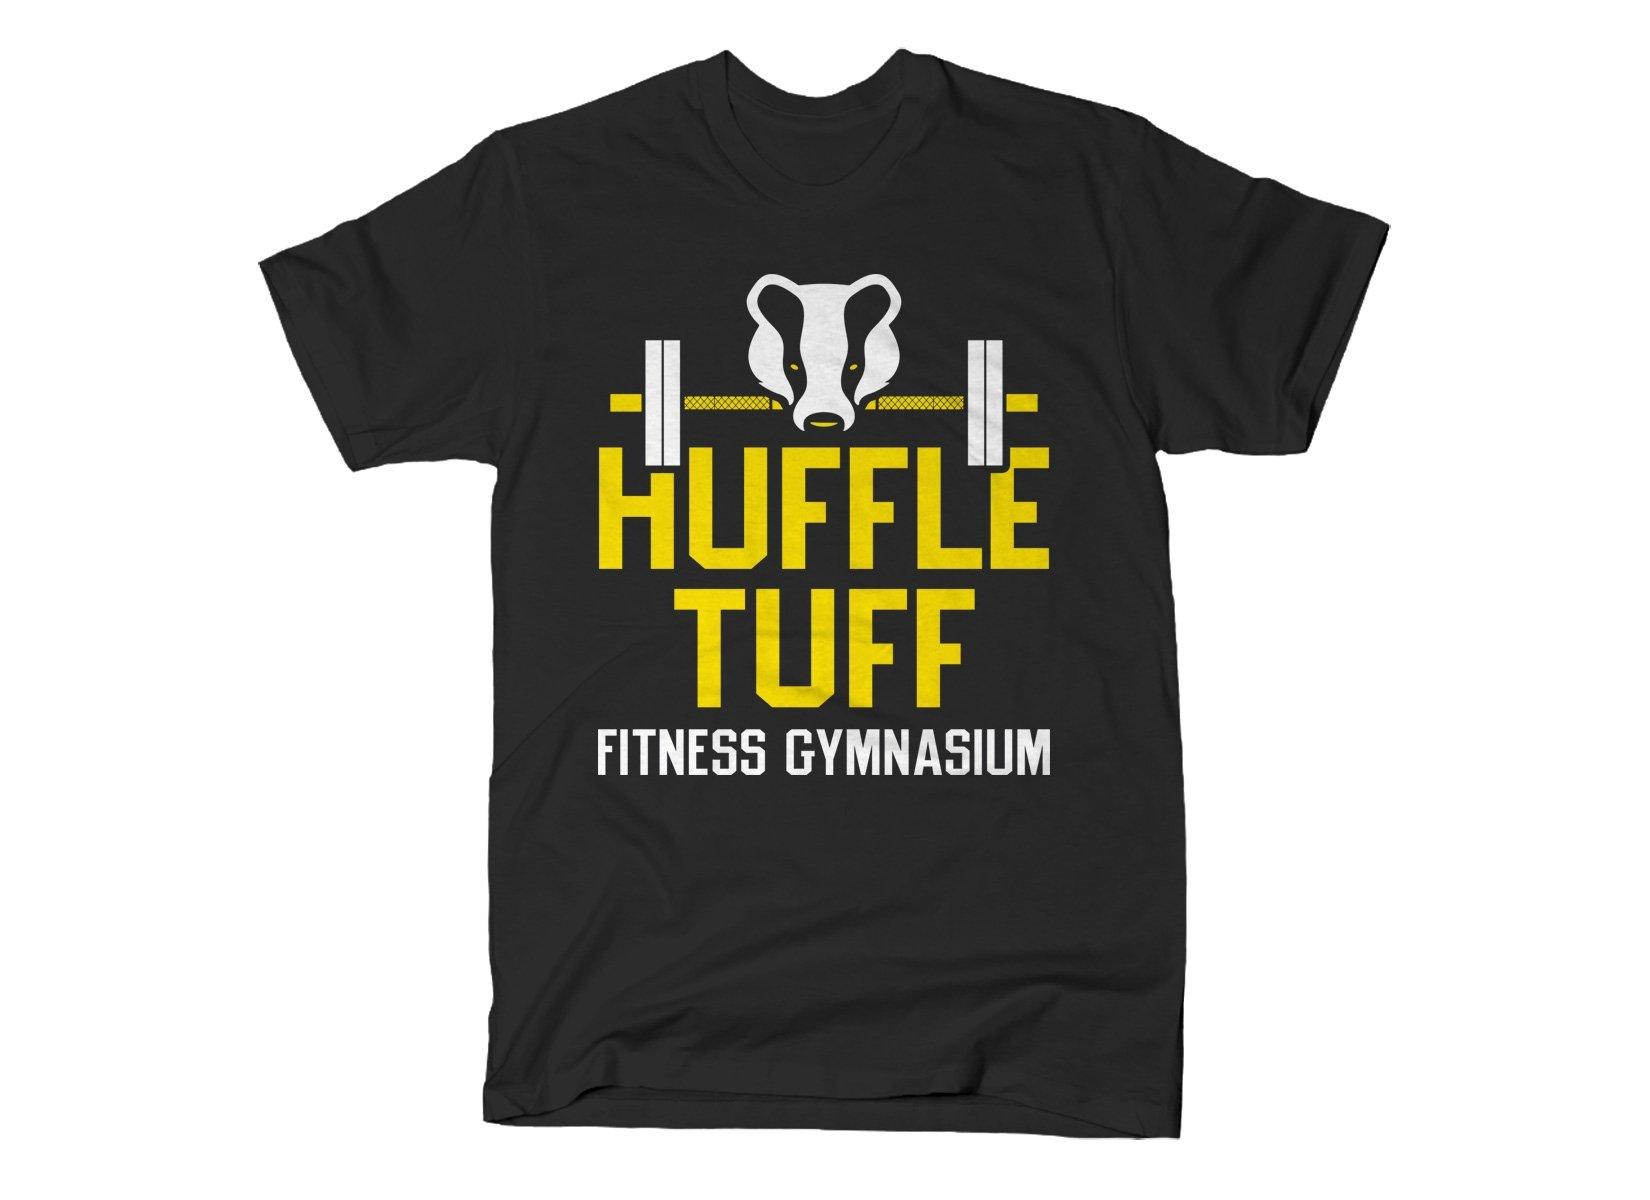 Huffle Tuff Gym on Mens T-Shirt